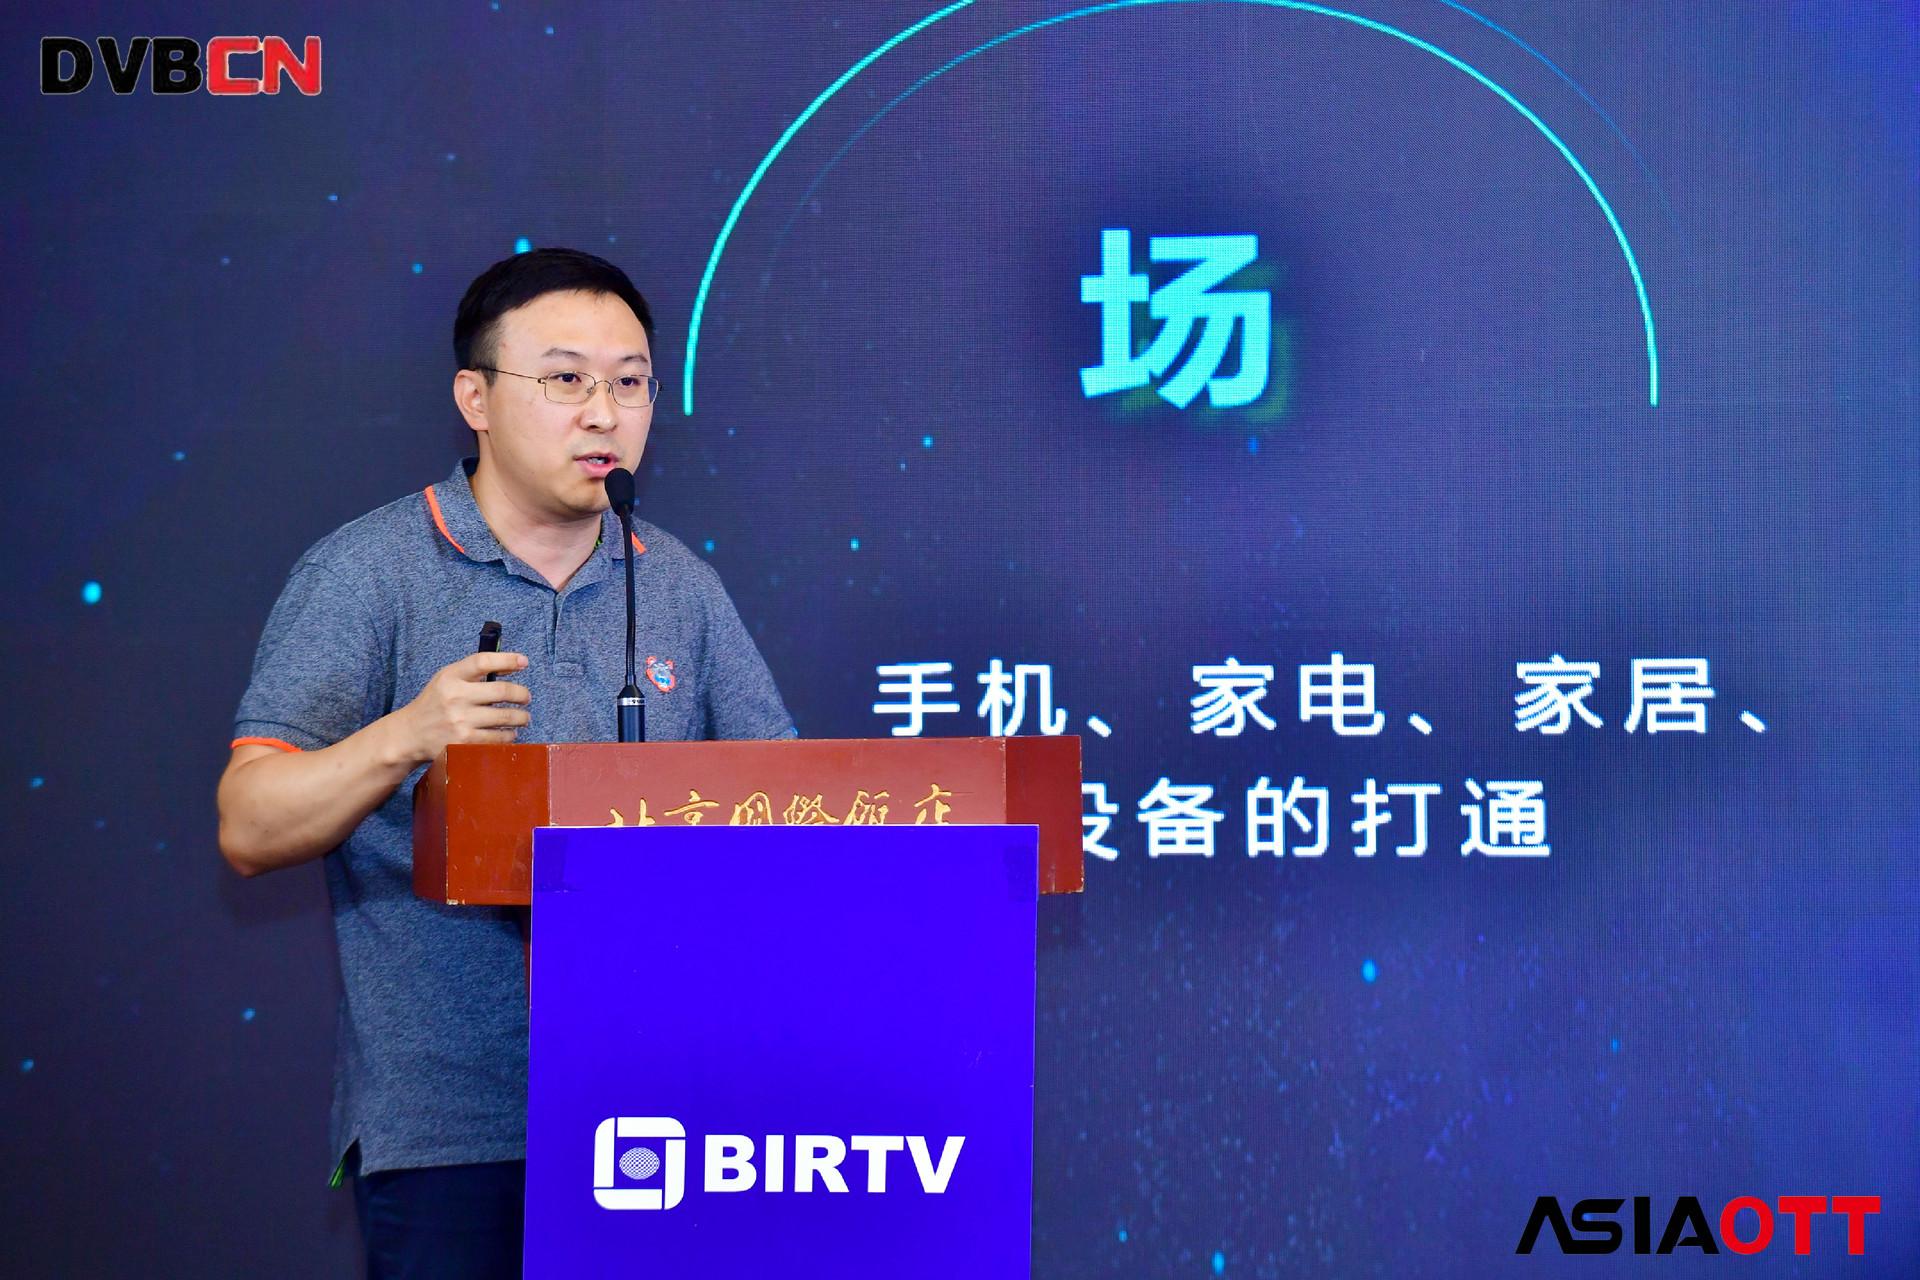 【BIRTV2019】奥维互娱黑维炜:截止今年6月4K电视保有量1.2亿,预计2020年OTT广告将达300亿